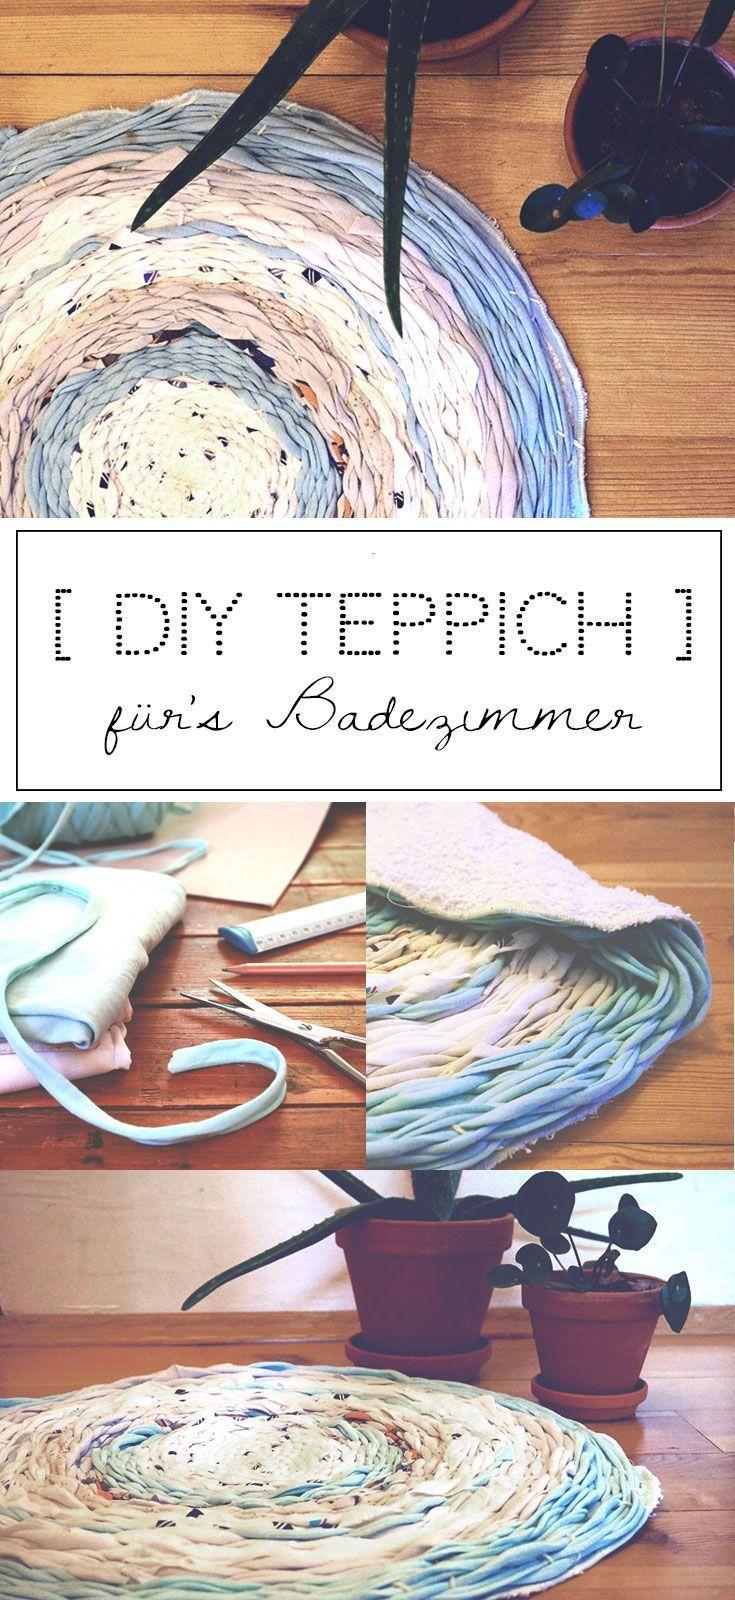 Upcycling Idee Aus Alten T Shirts Diy Teppich Fur S Badezimmer